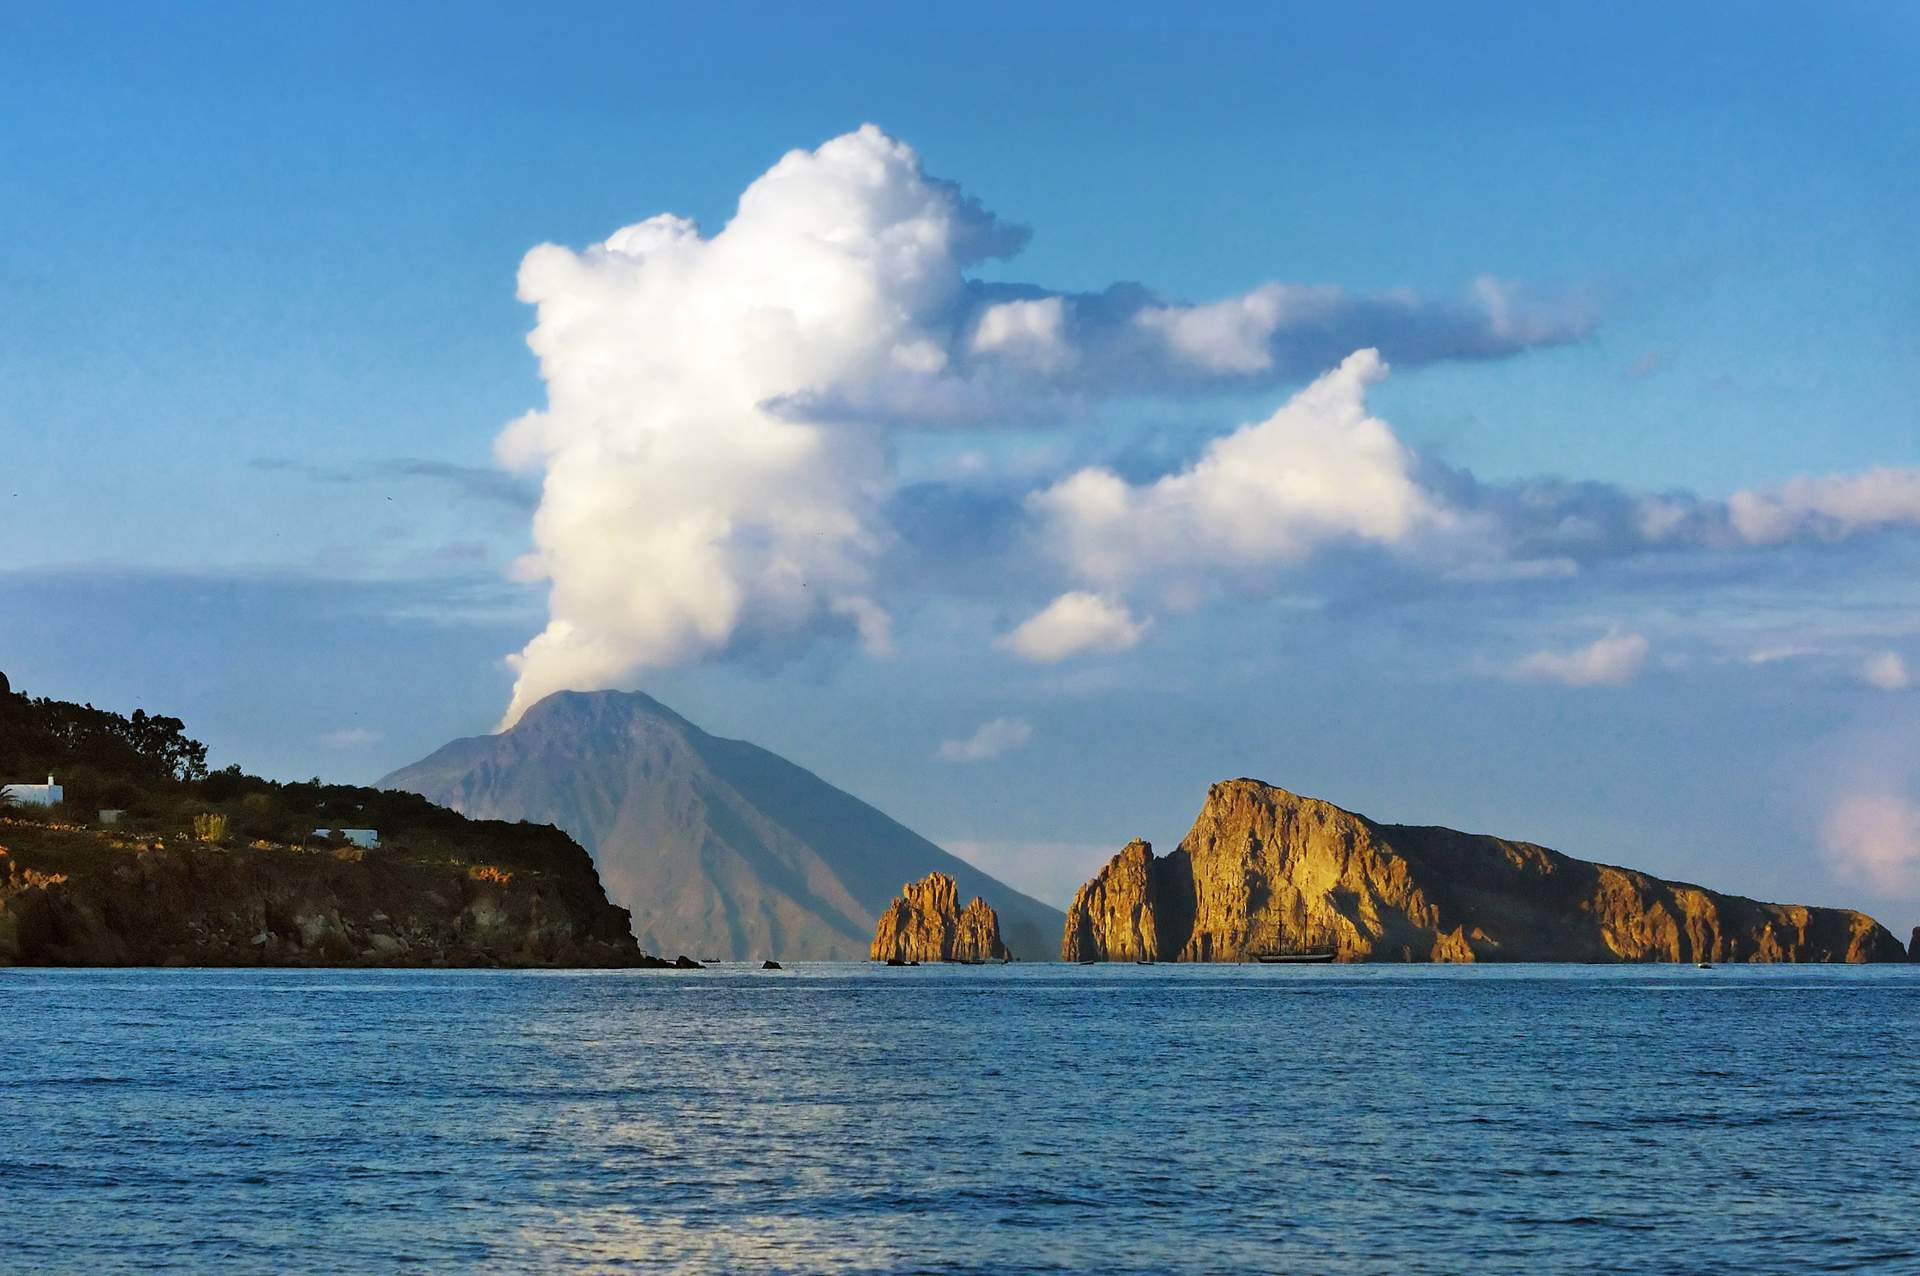 Liparische Inseln: Stromboli